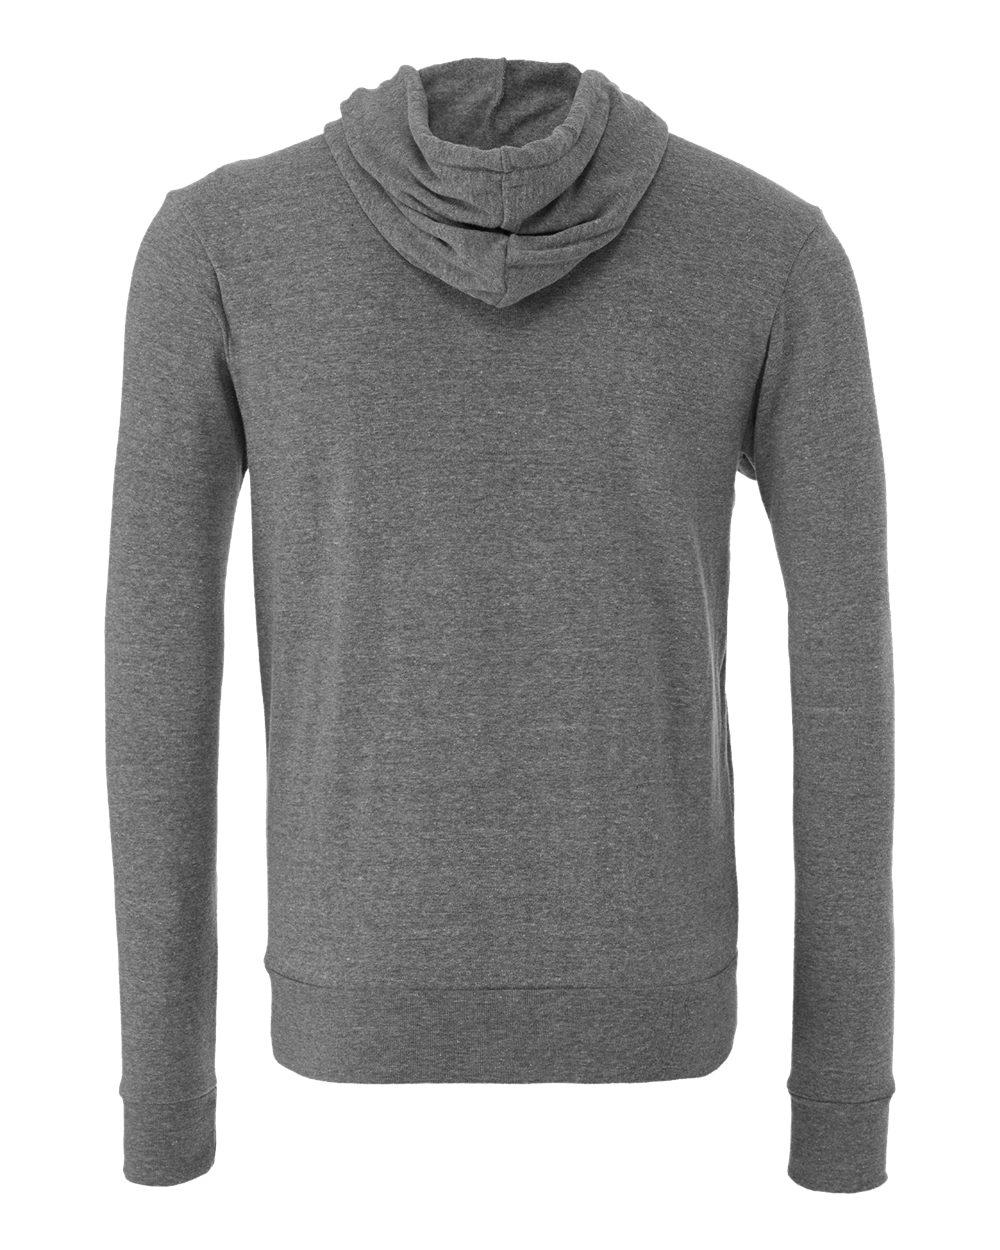 Bella-Canvas-Unisex-Full-Zip-Up-Hooded-Sweatshirt-Blank-Hoodie-3739-up-to-3XL thumbnail 22